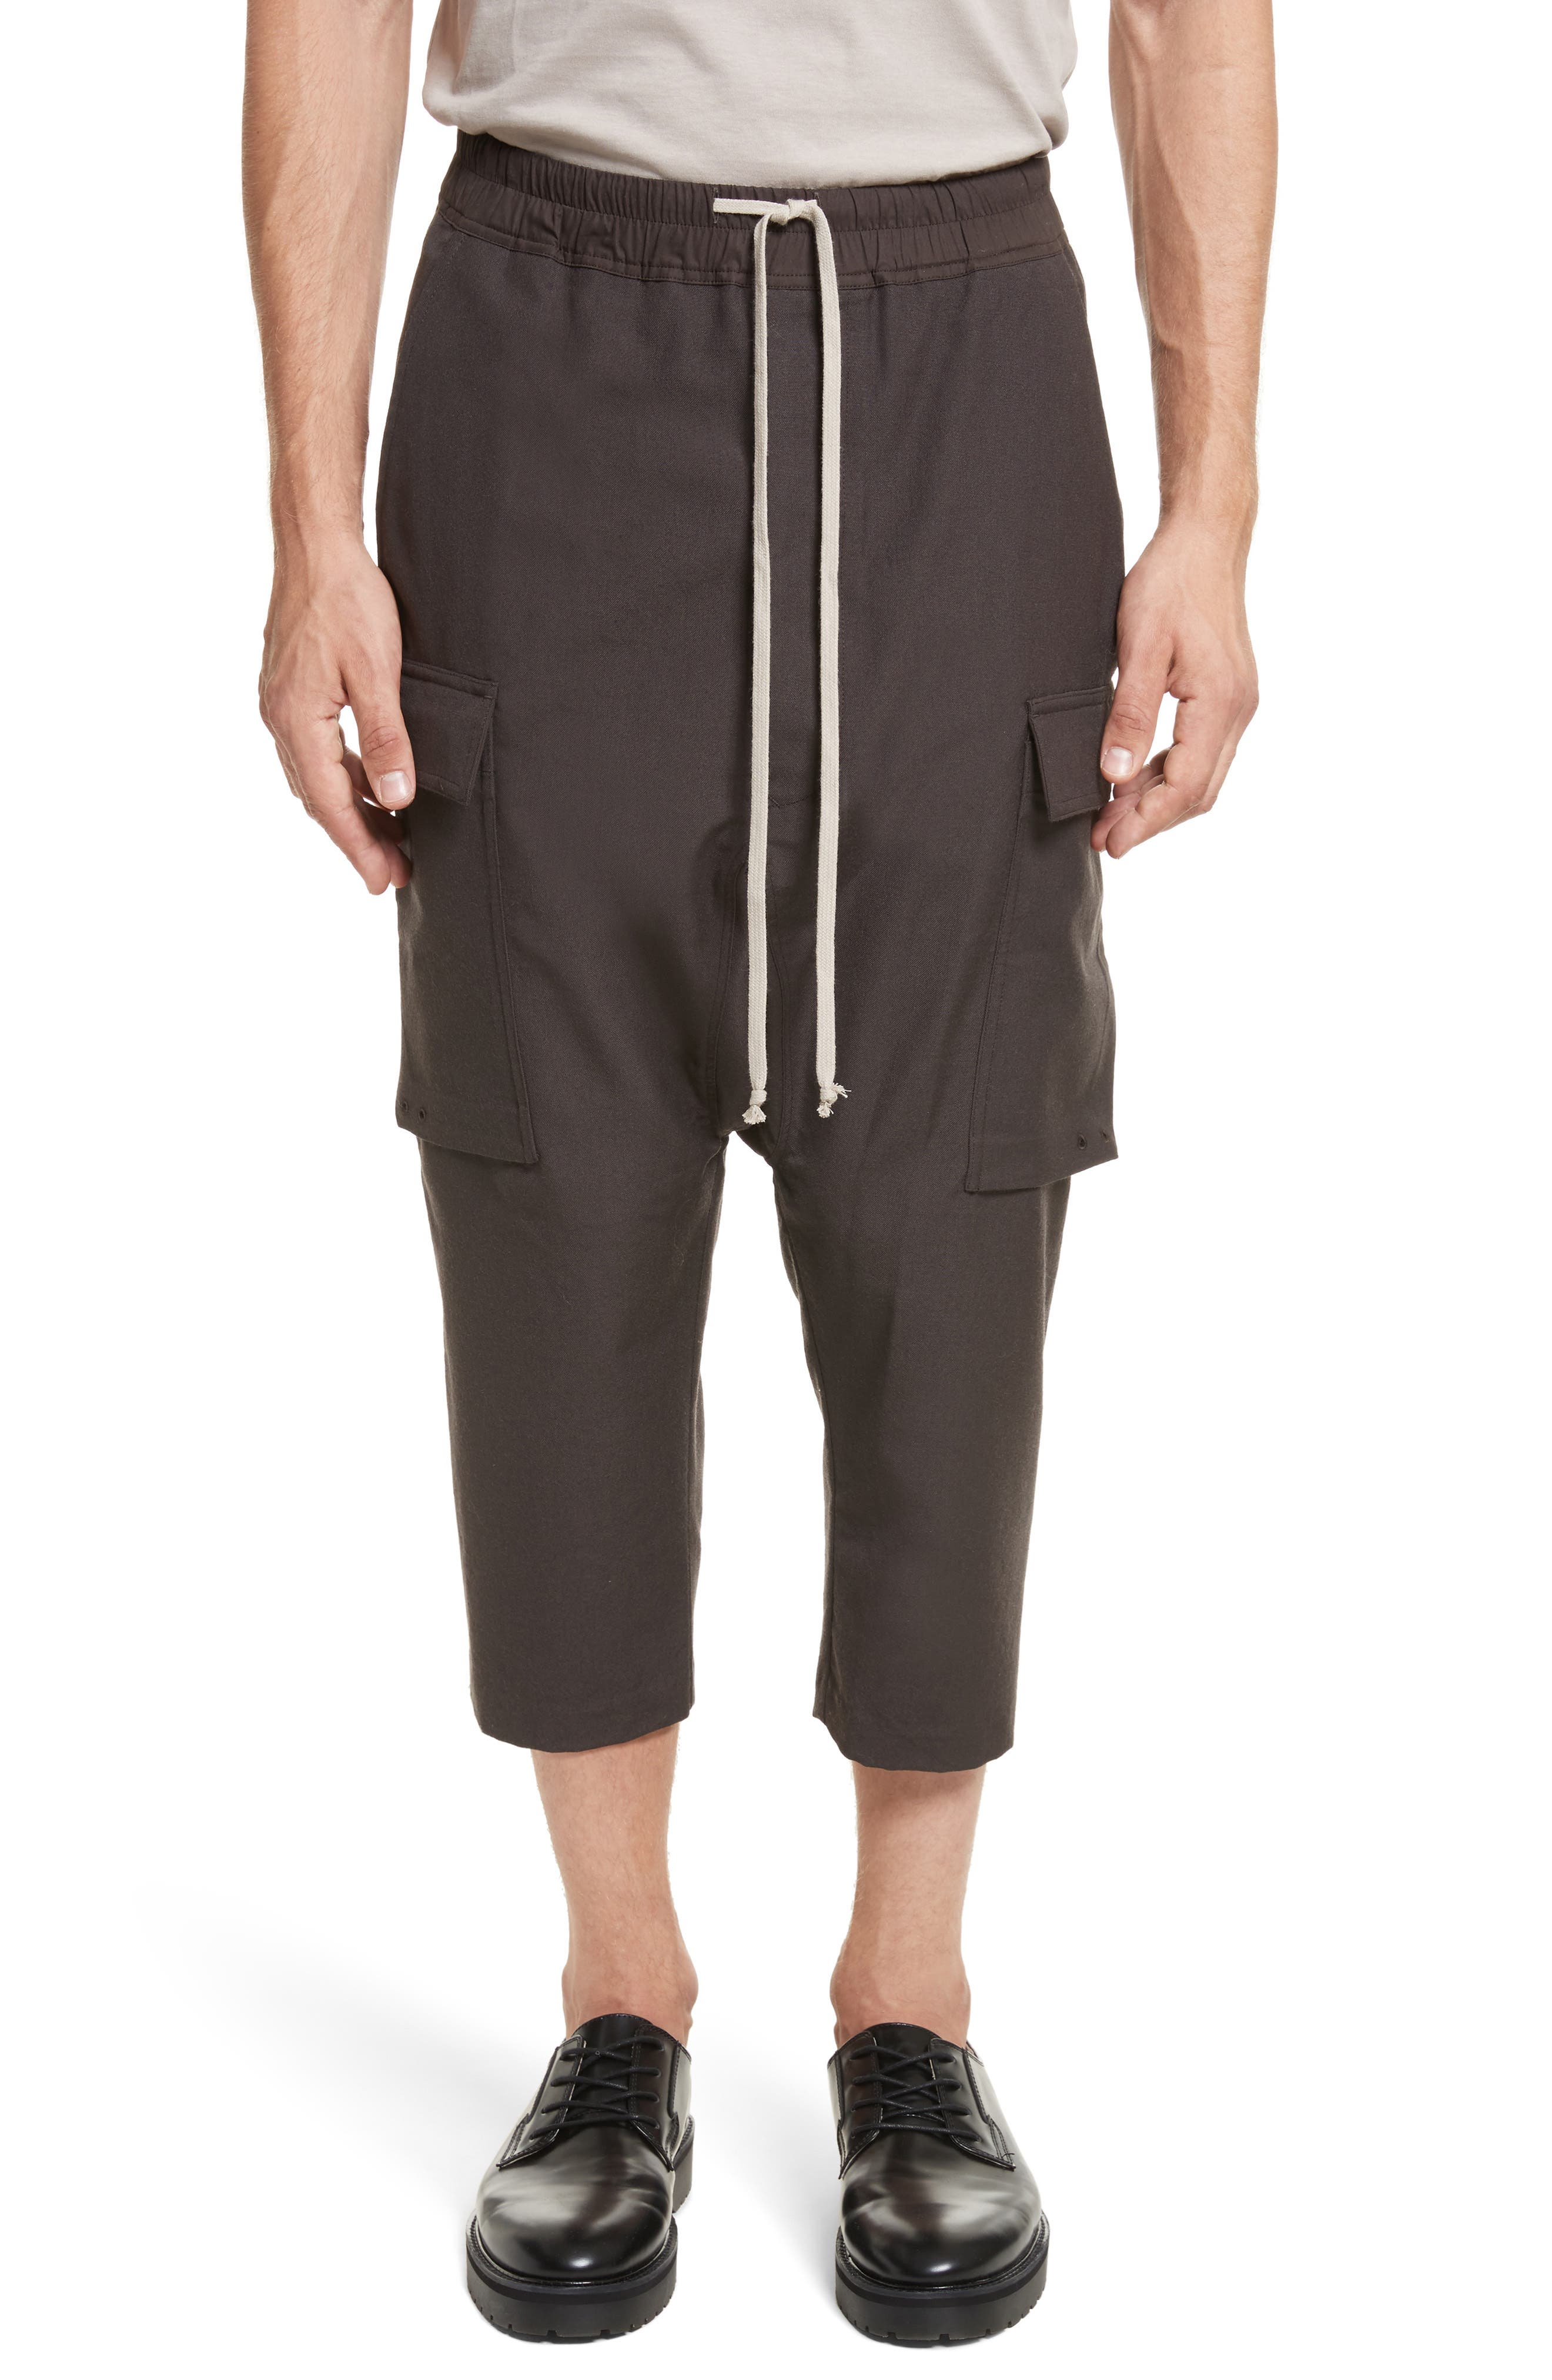 Rick Owens Cropped Drawstring Cargo Pants